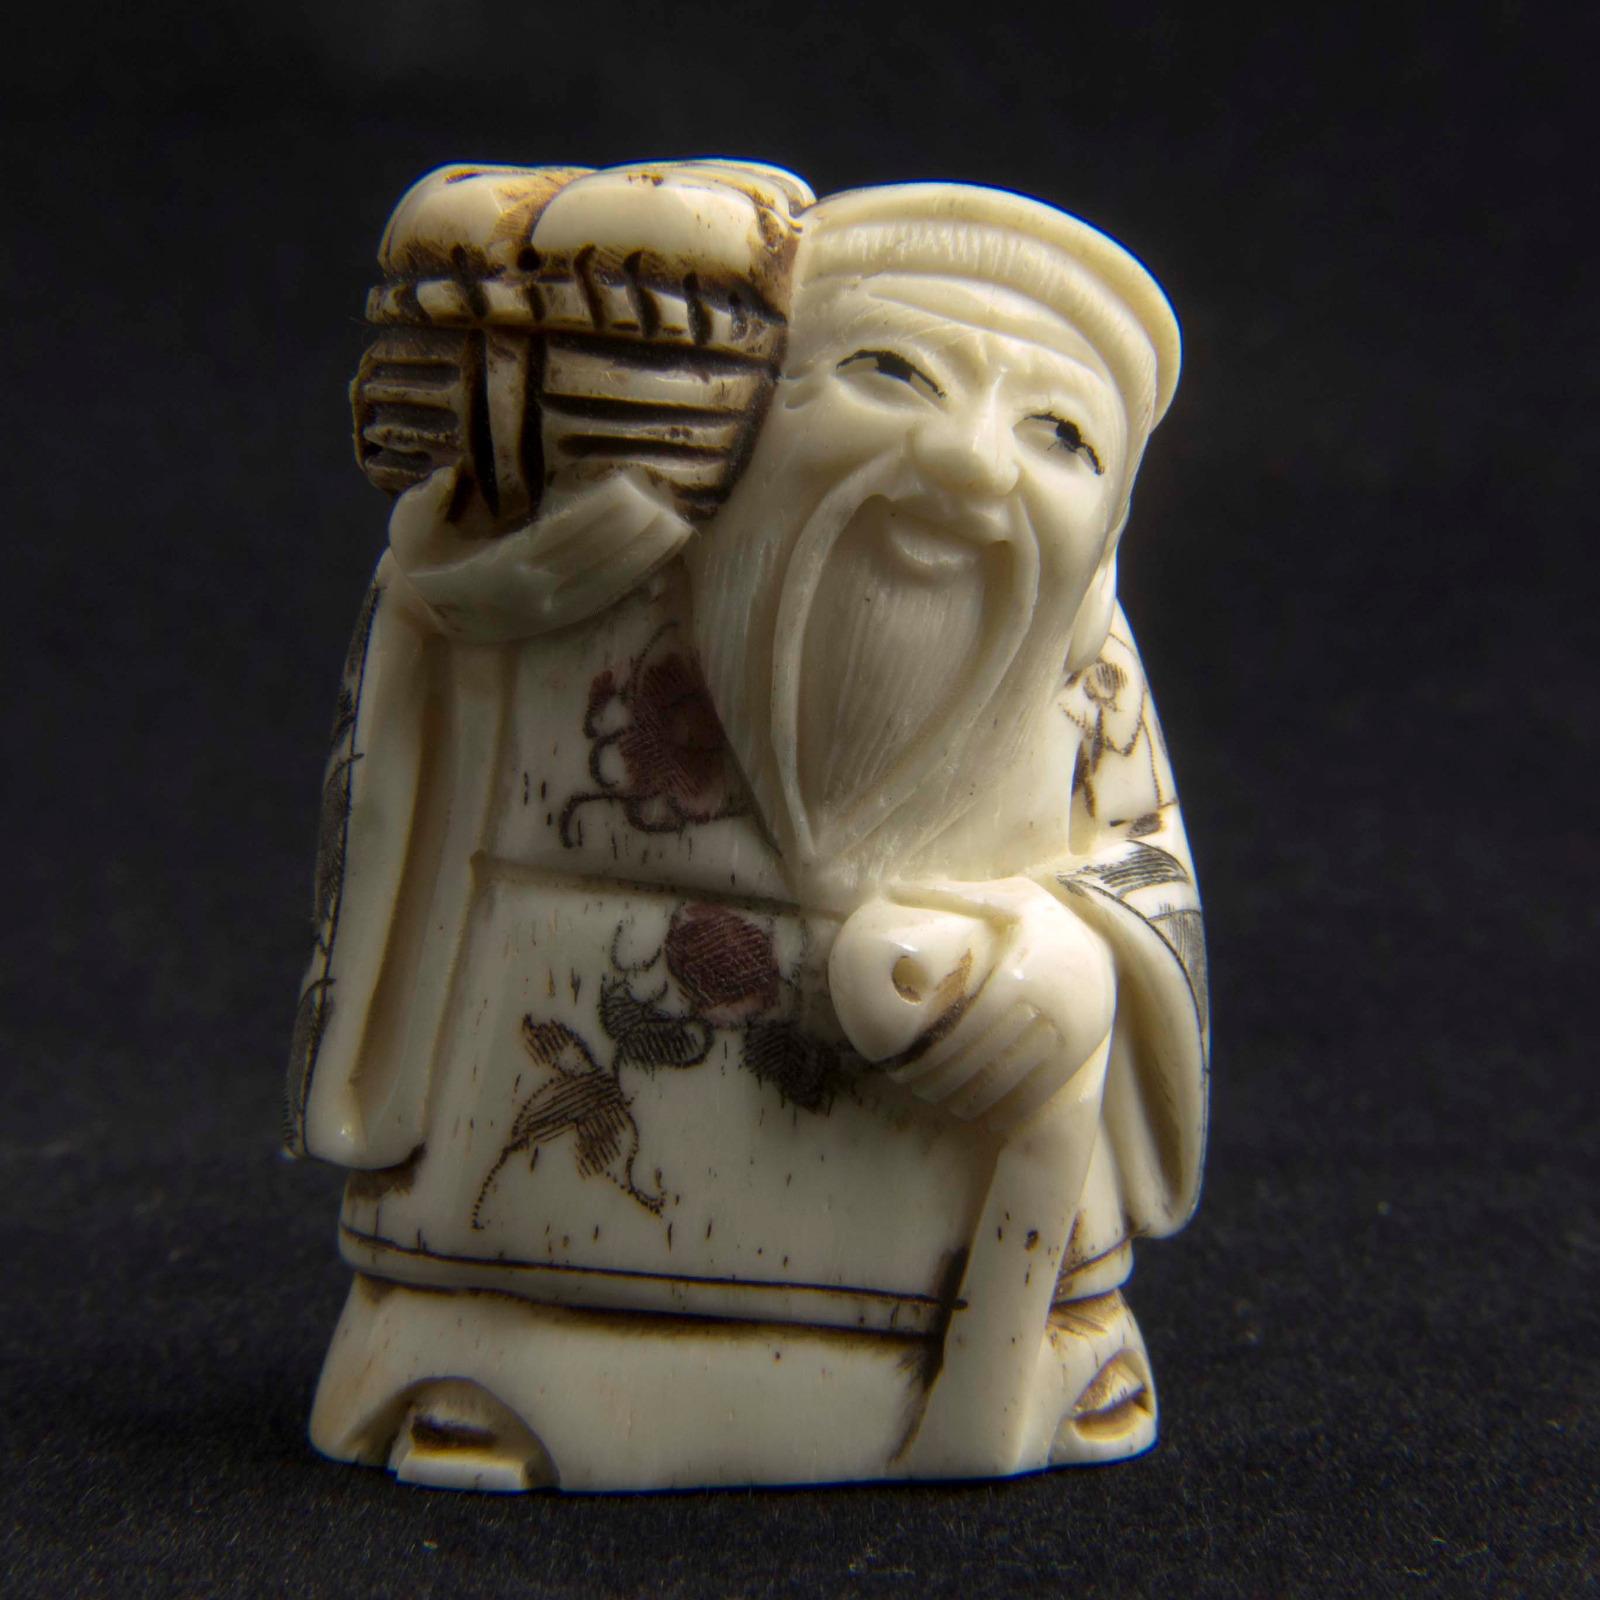 Japanese Carved Bone Netsuke 3207 La180383 Loveantiques Com